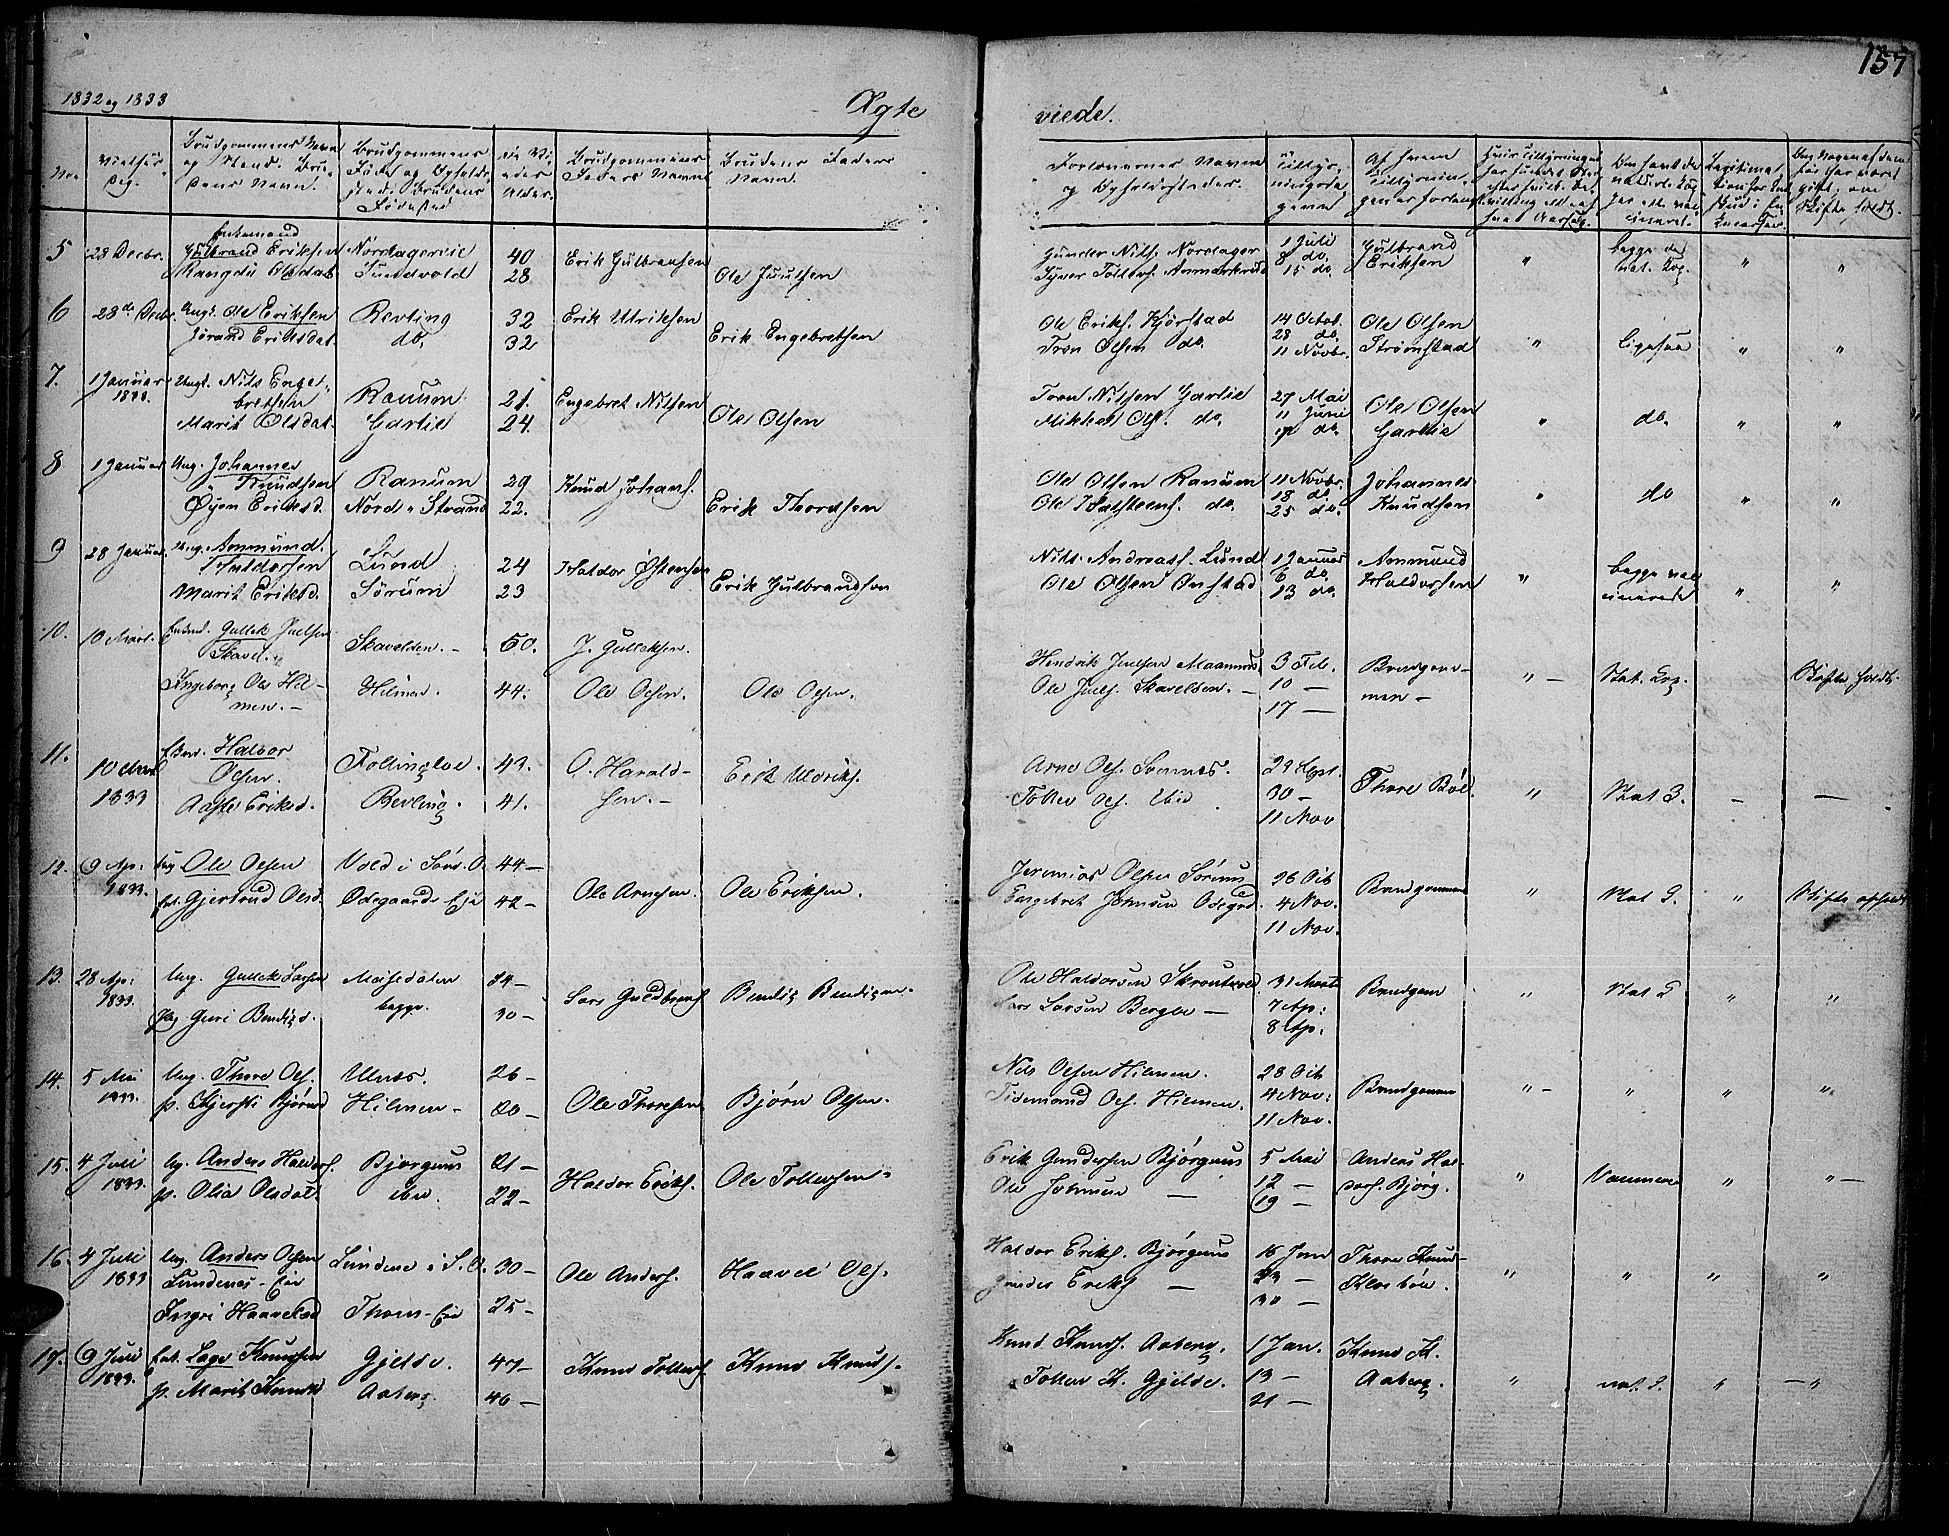 SAH, Nord-Aurdal prestekontor, Ministerialbok nr. 3, 1828-1841, s. 157